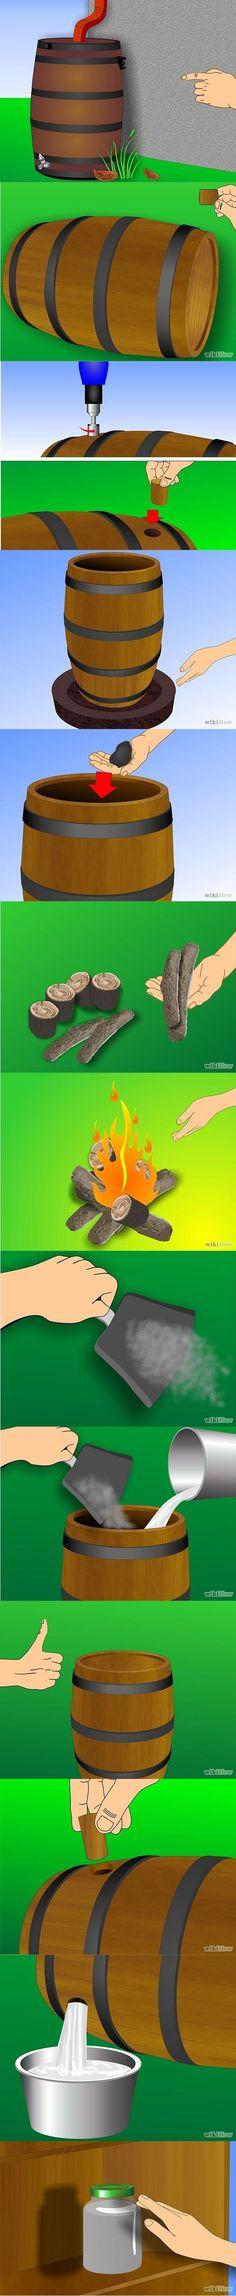 How to Make Lye: 13 Steps - wikiHow